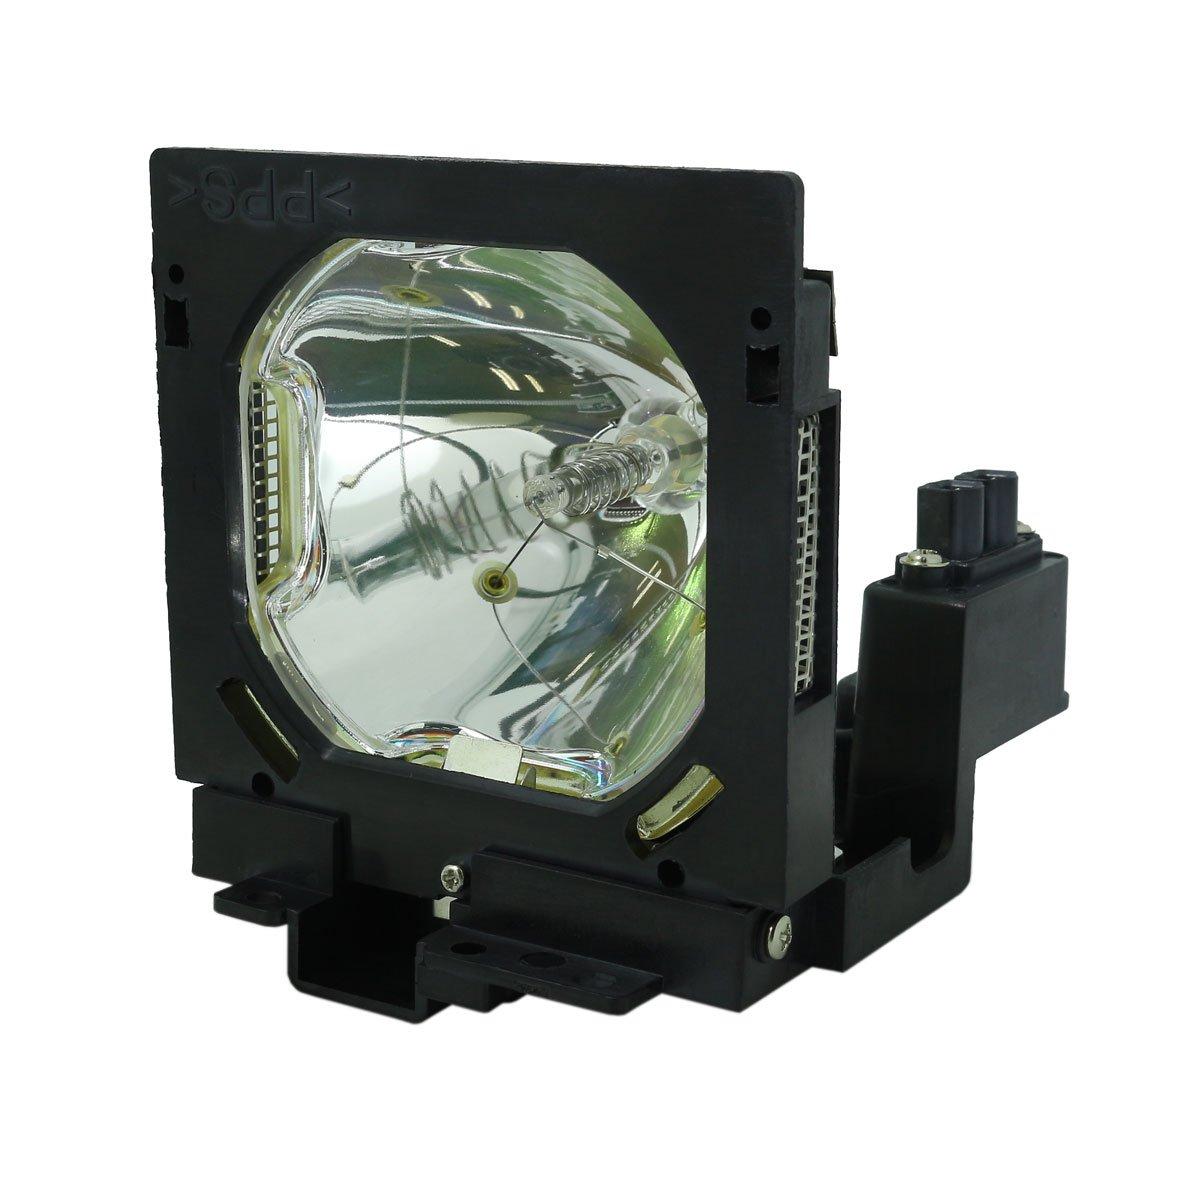 SANYO PLC-EF32L プロジェクター交換用ランプ ハウジング付き B007CJQBOQ